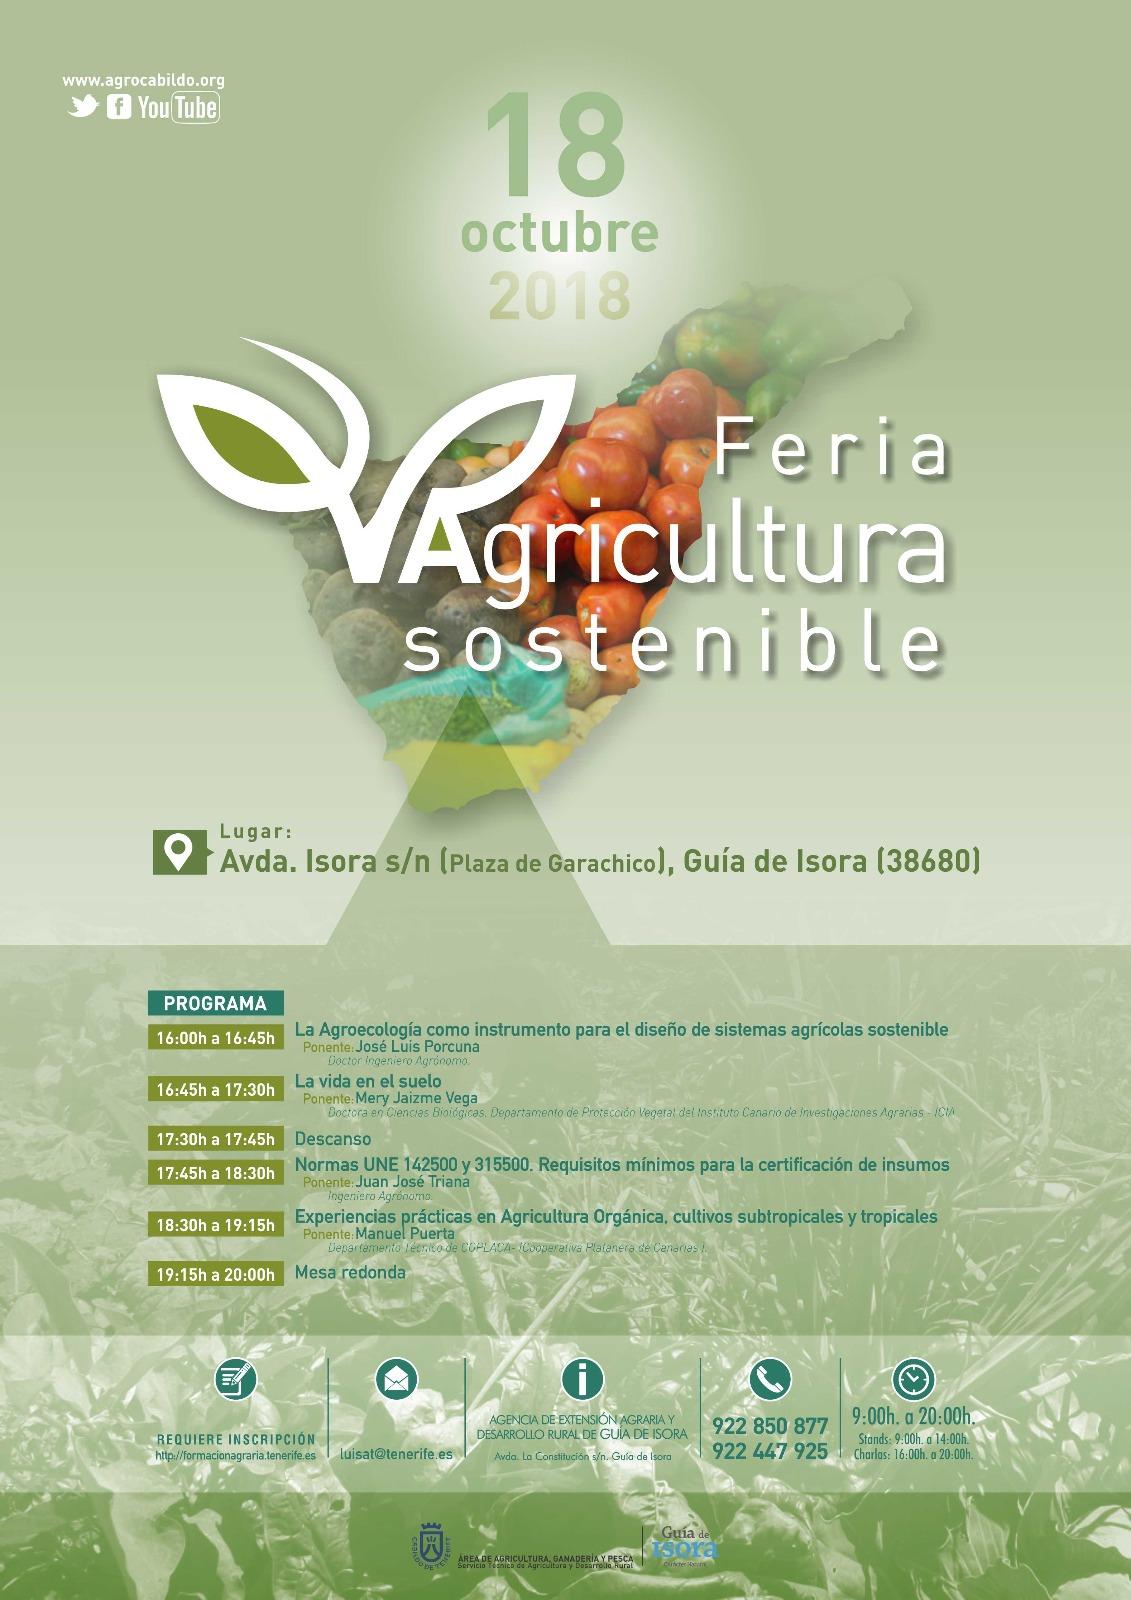 Cartel wathsapp Feria Agric Sostenible 18 oct